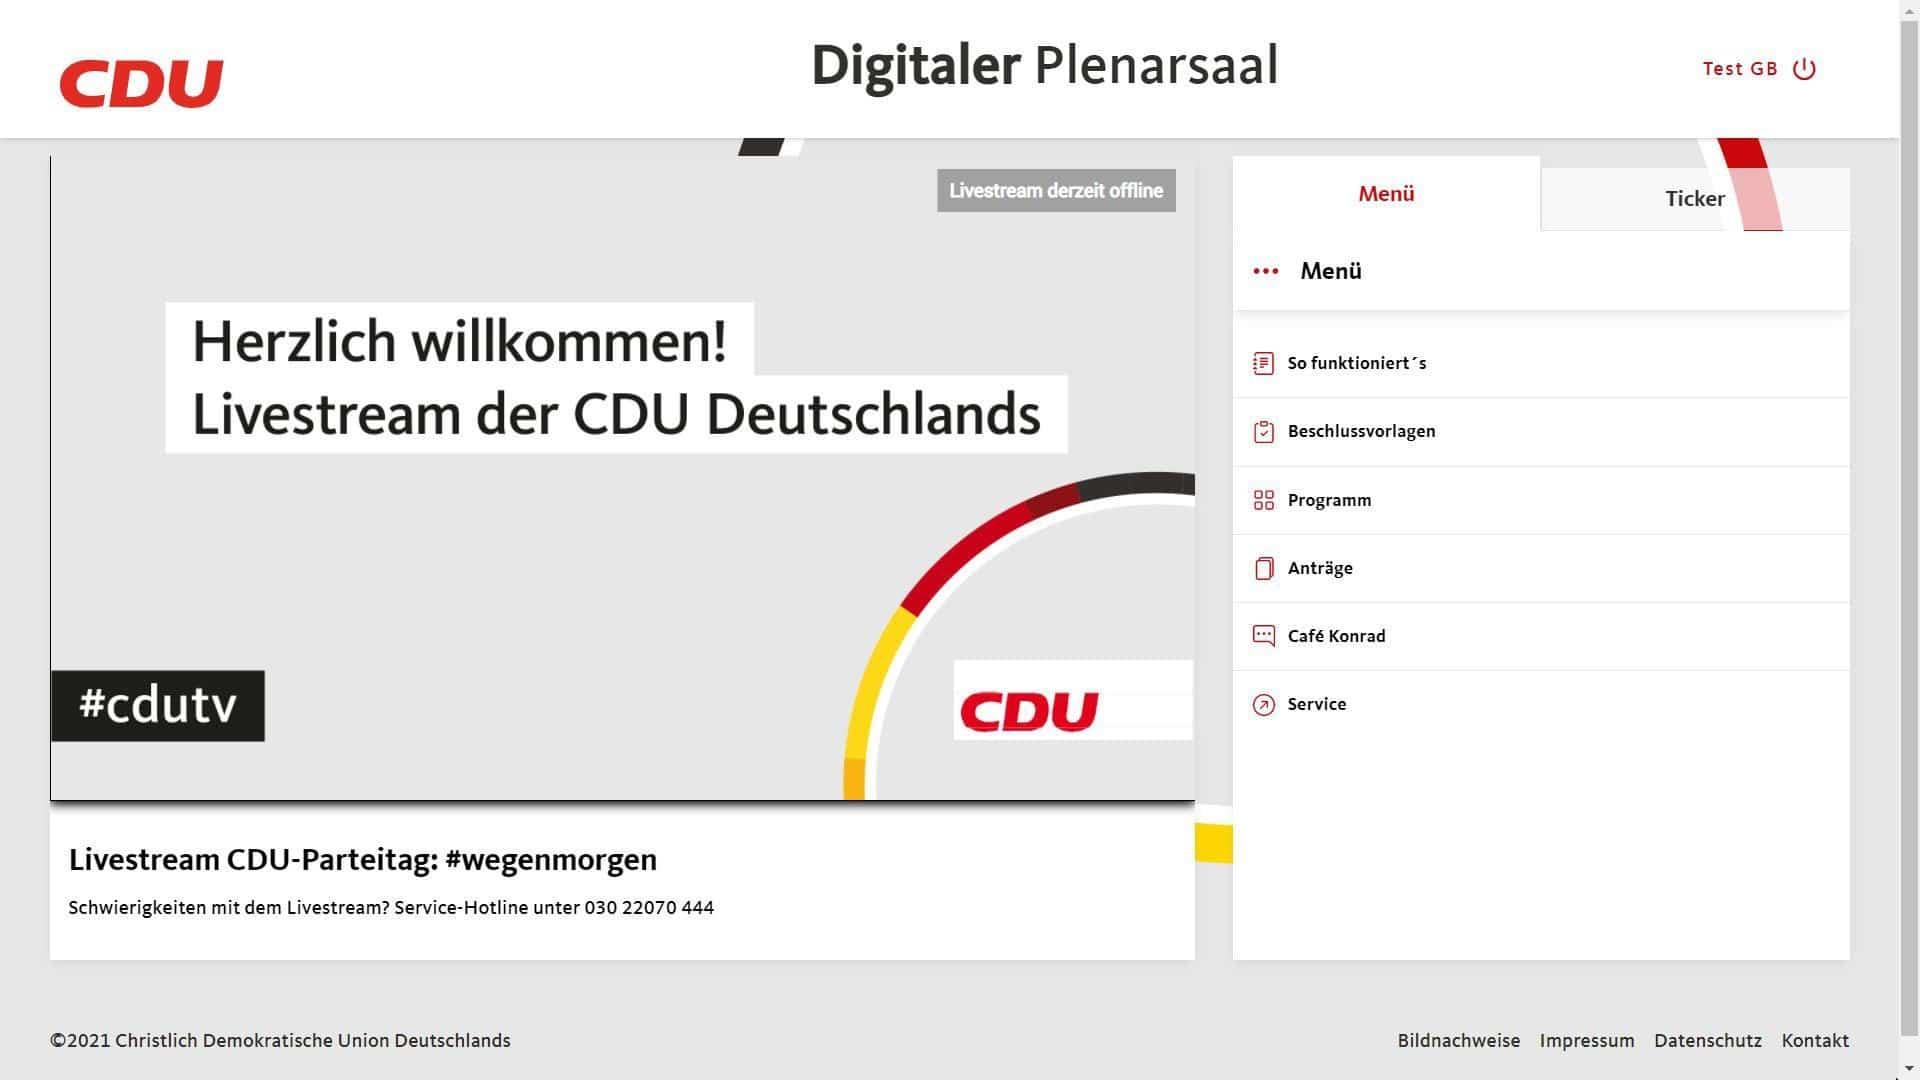 CDU Parteitag Digitaler Plenarsaal